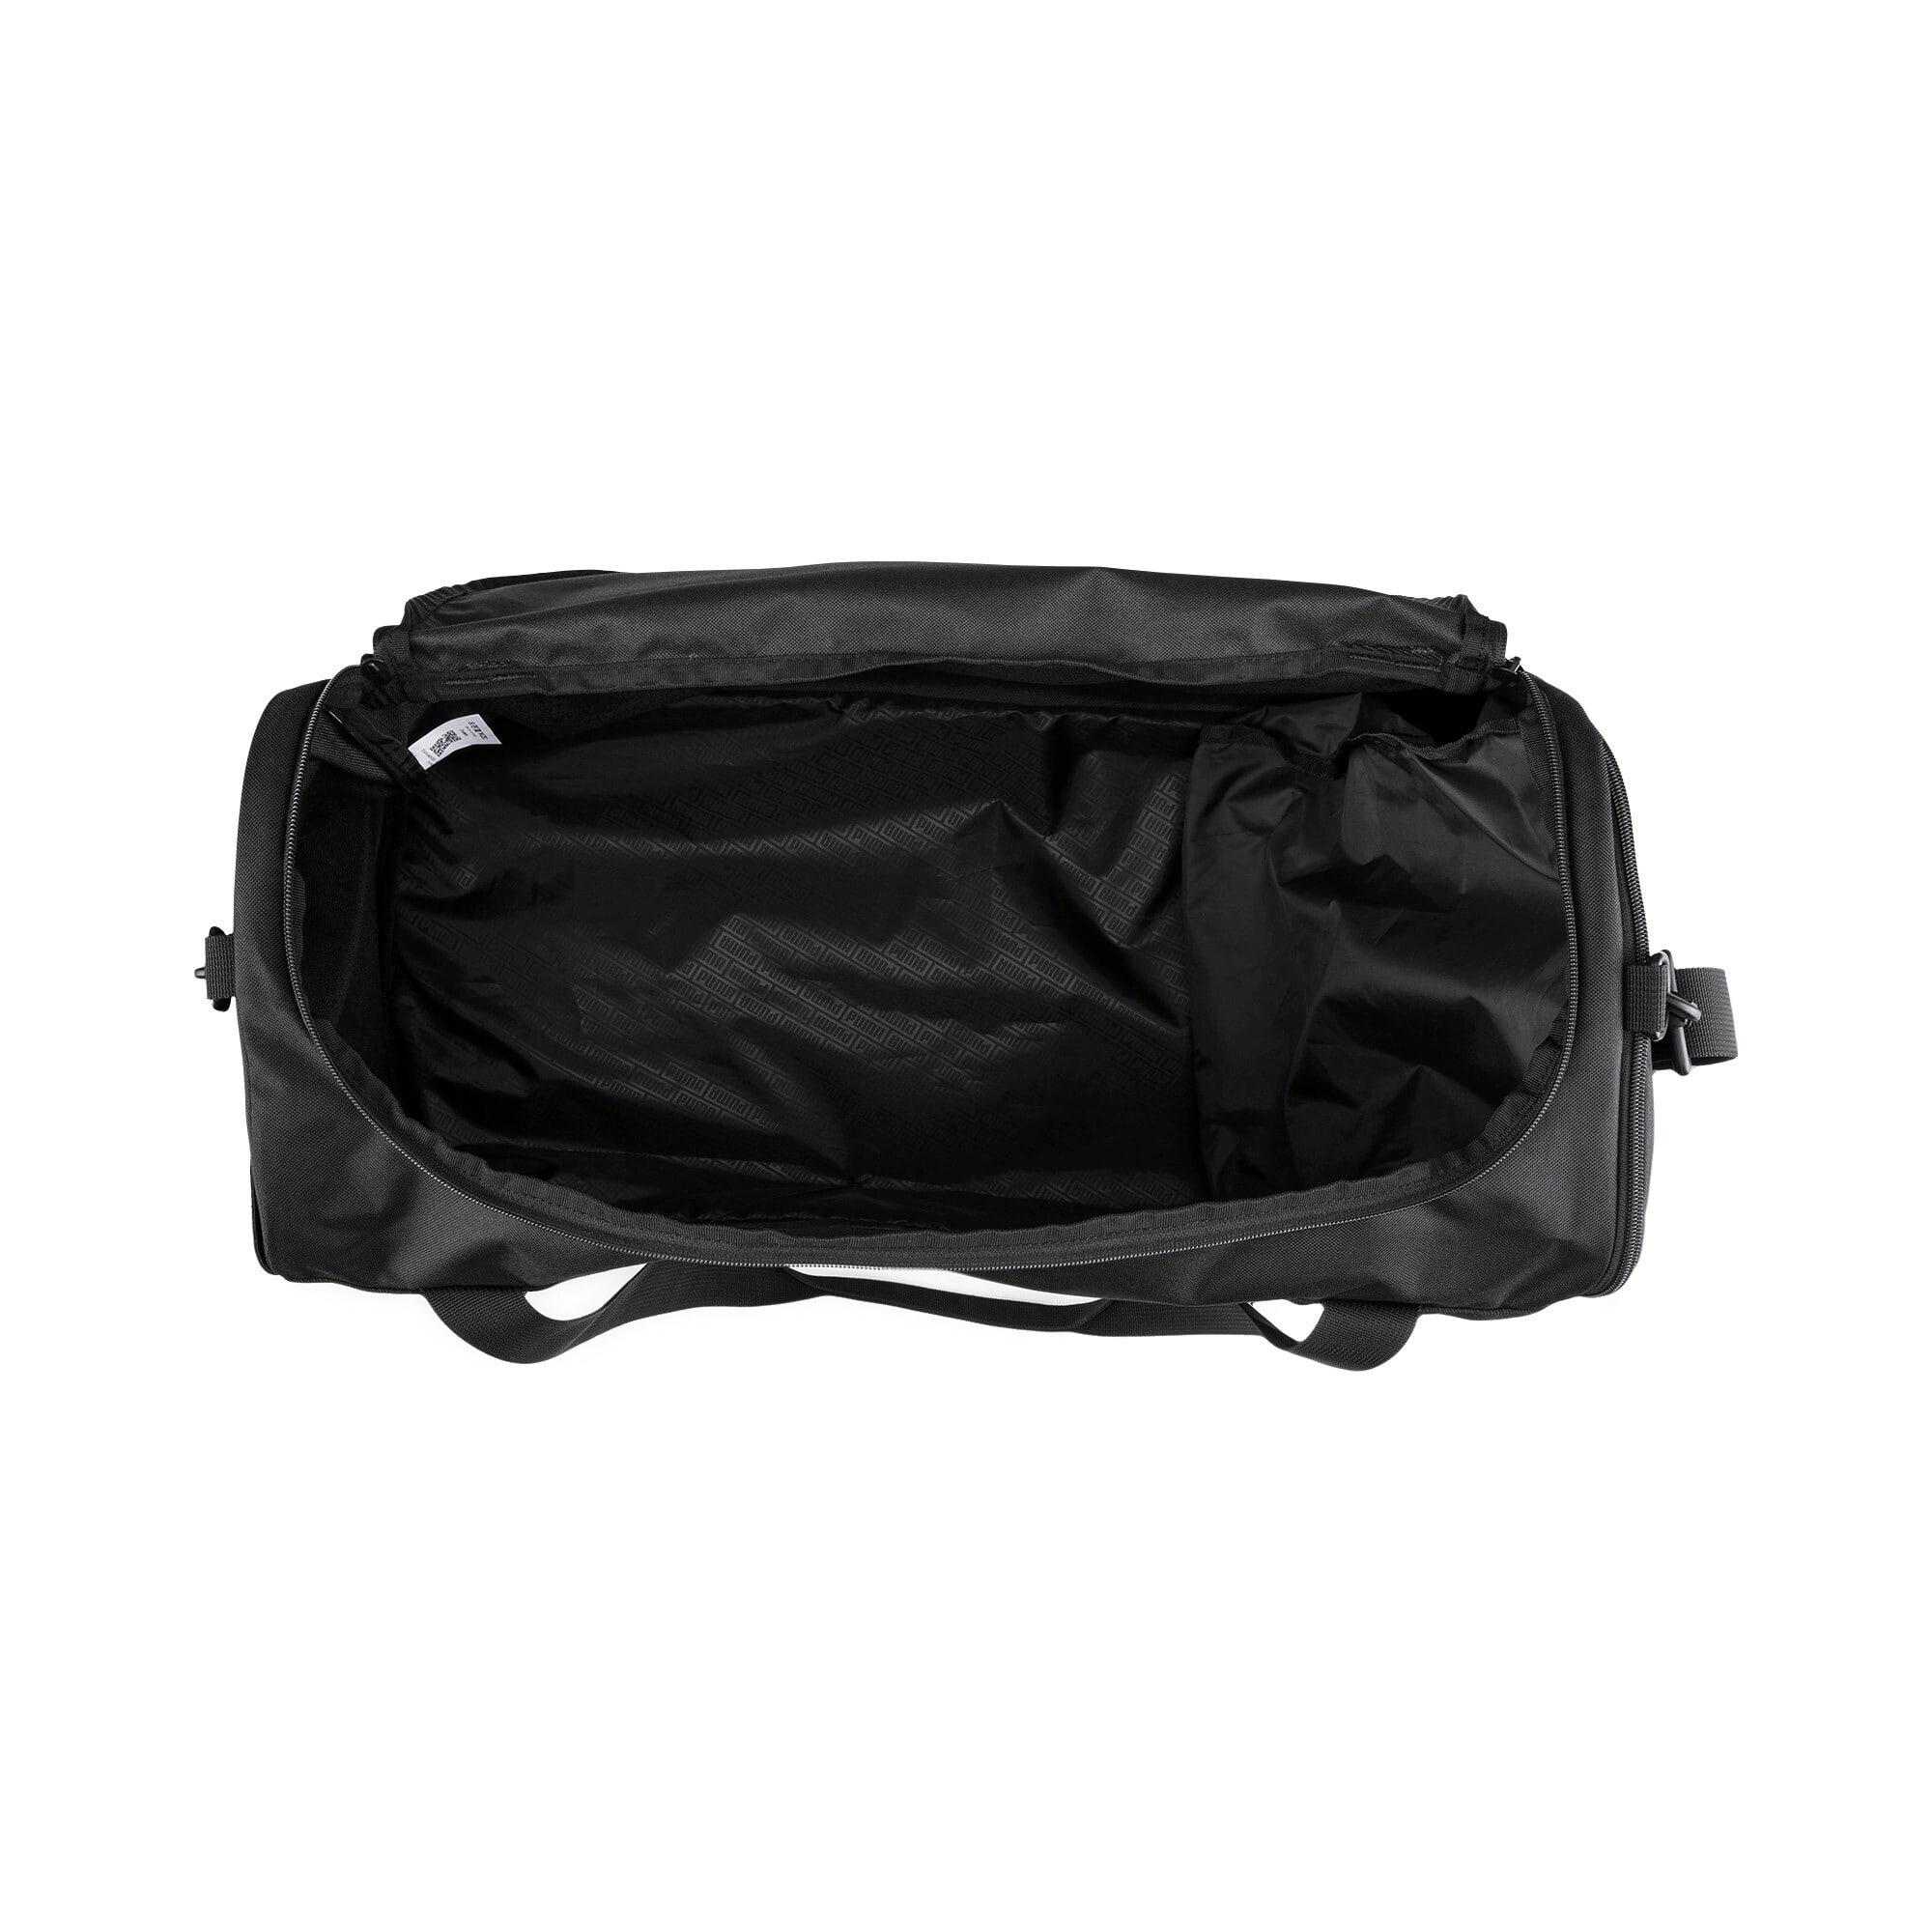 Thumbnail 6 of PUMA Challenger Duffel Bag, Puma Black, medium